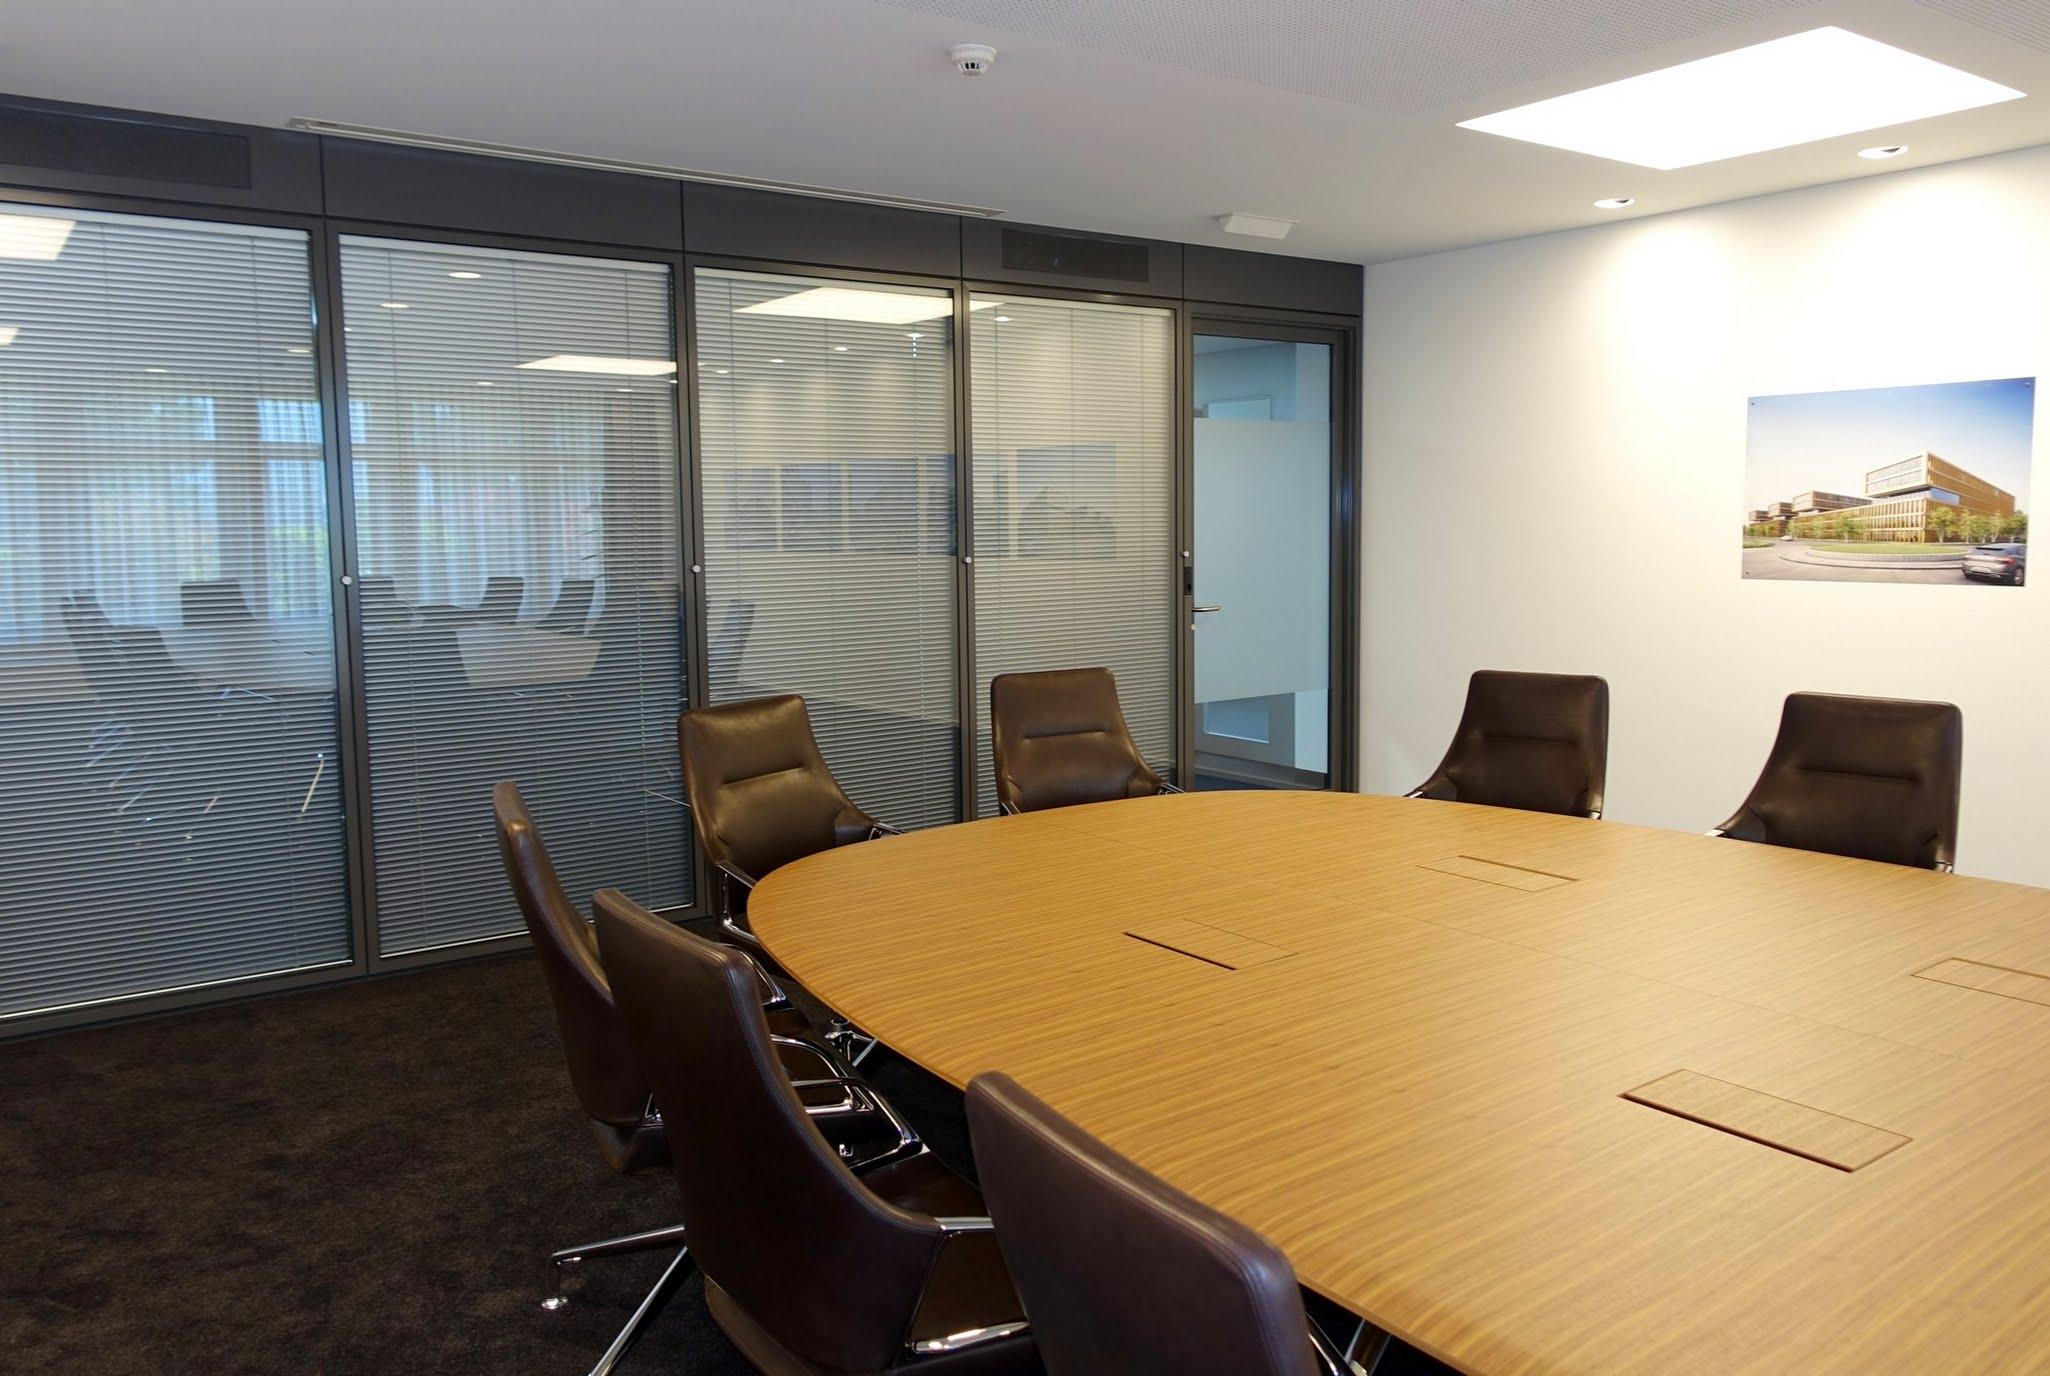 NovaFlex - Bürotrennwand,Alfred Müller AG,Deckensystem-Wandsysteme,Trennwände Büro,Ganzglaswände,Bürotrennwand,Akustikdecken,Schallschutzdecken,Trennwände,Glaswände,Faltwände,Raumgestaltung,Trennwand Systeme